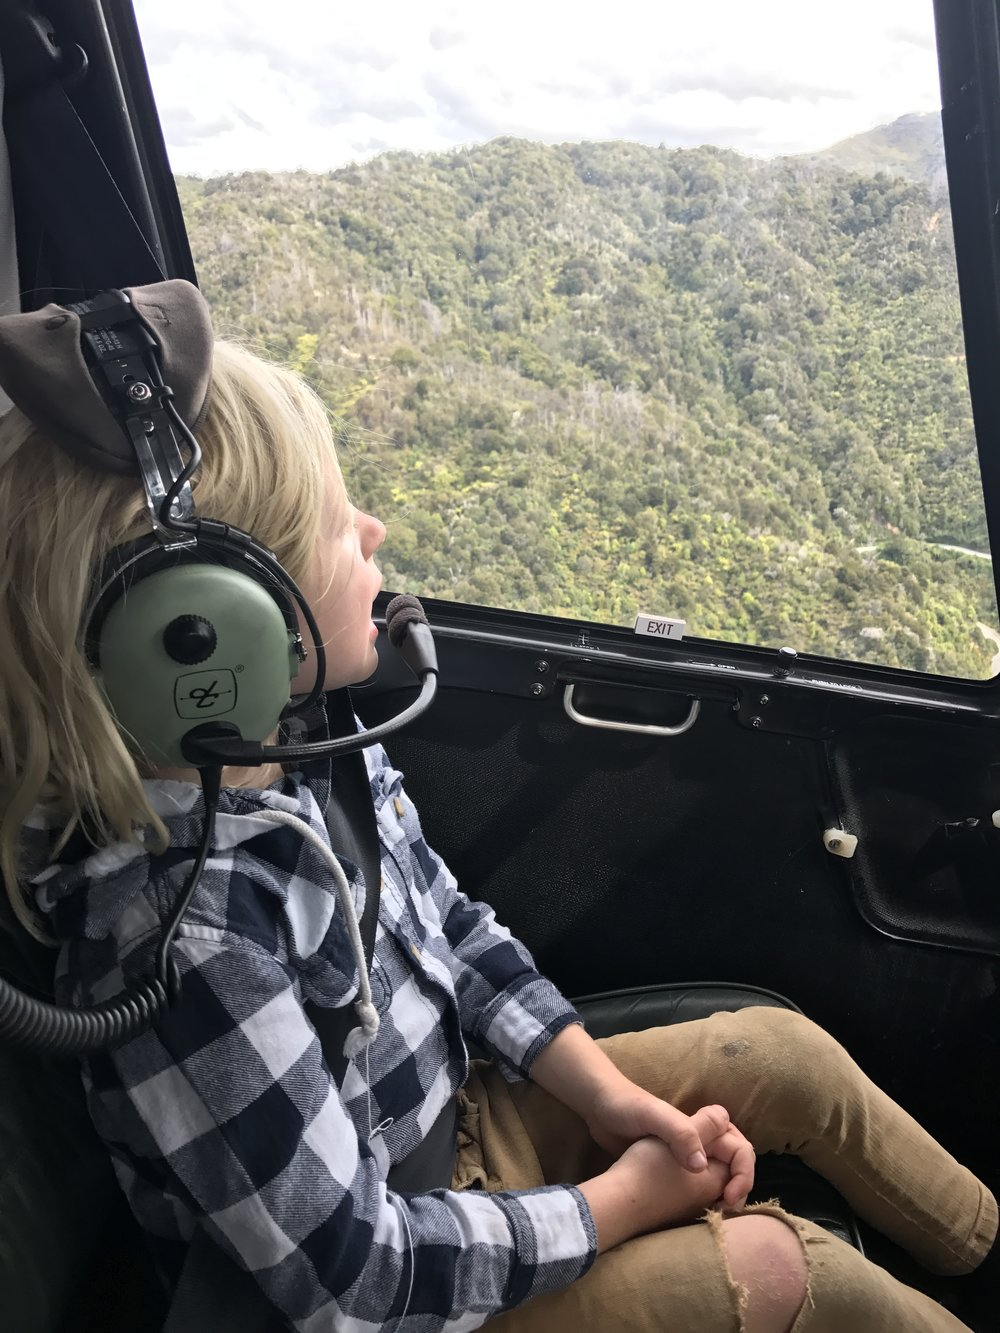 belandbeau_family adventure helicopter ride new zealand_4.jpg